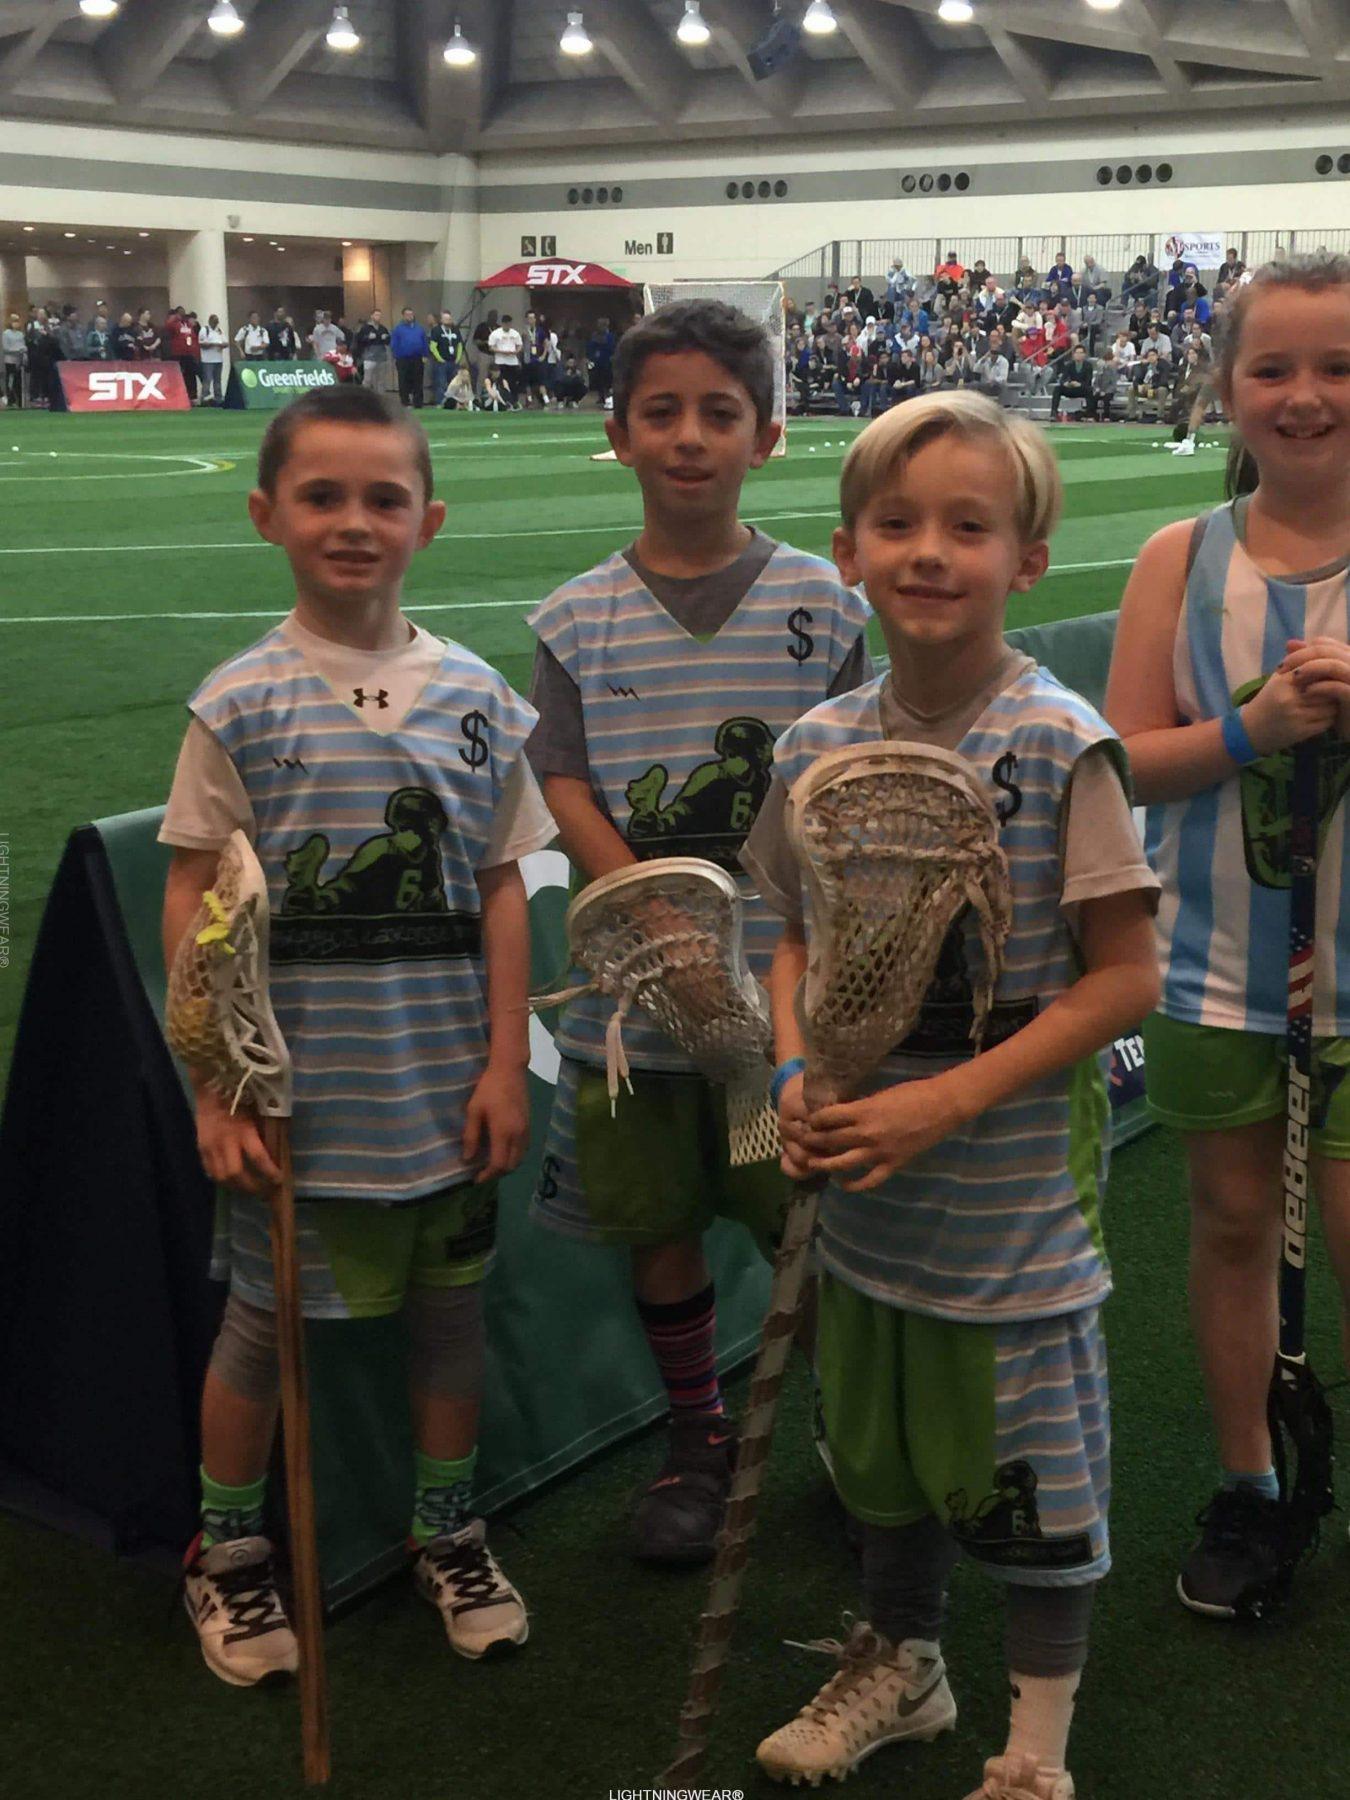 custom youth lacrosse uniforms